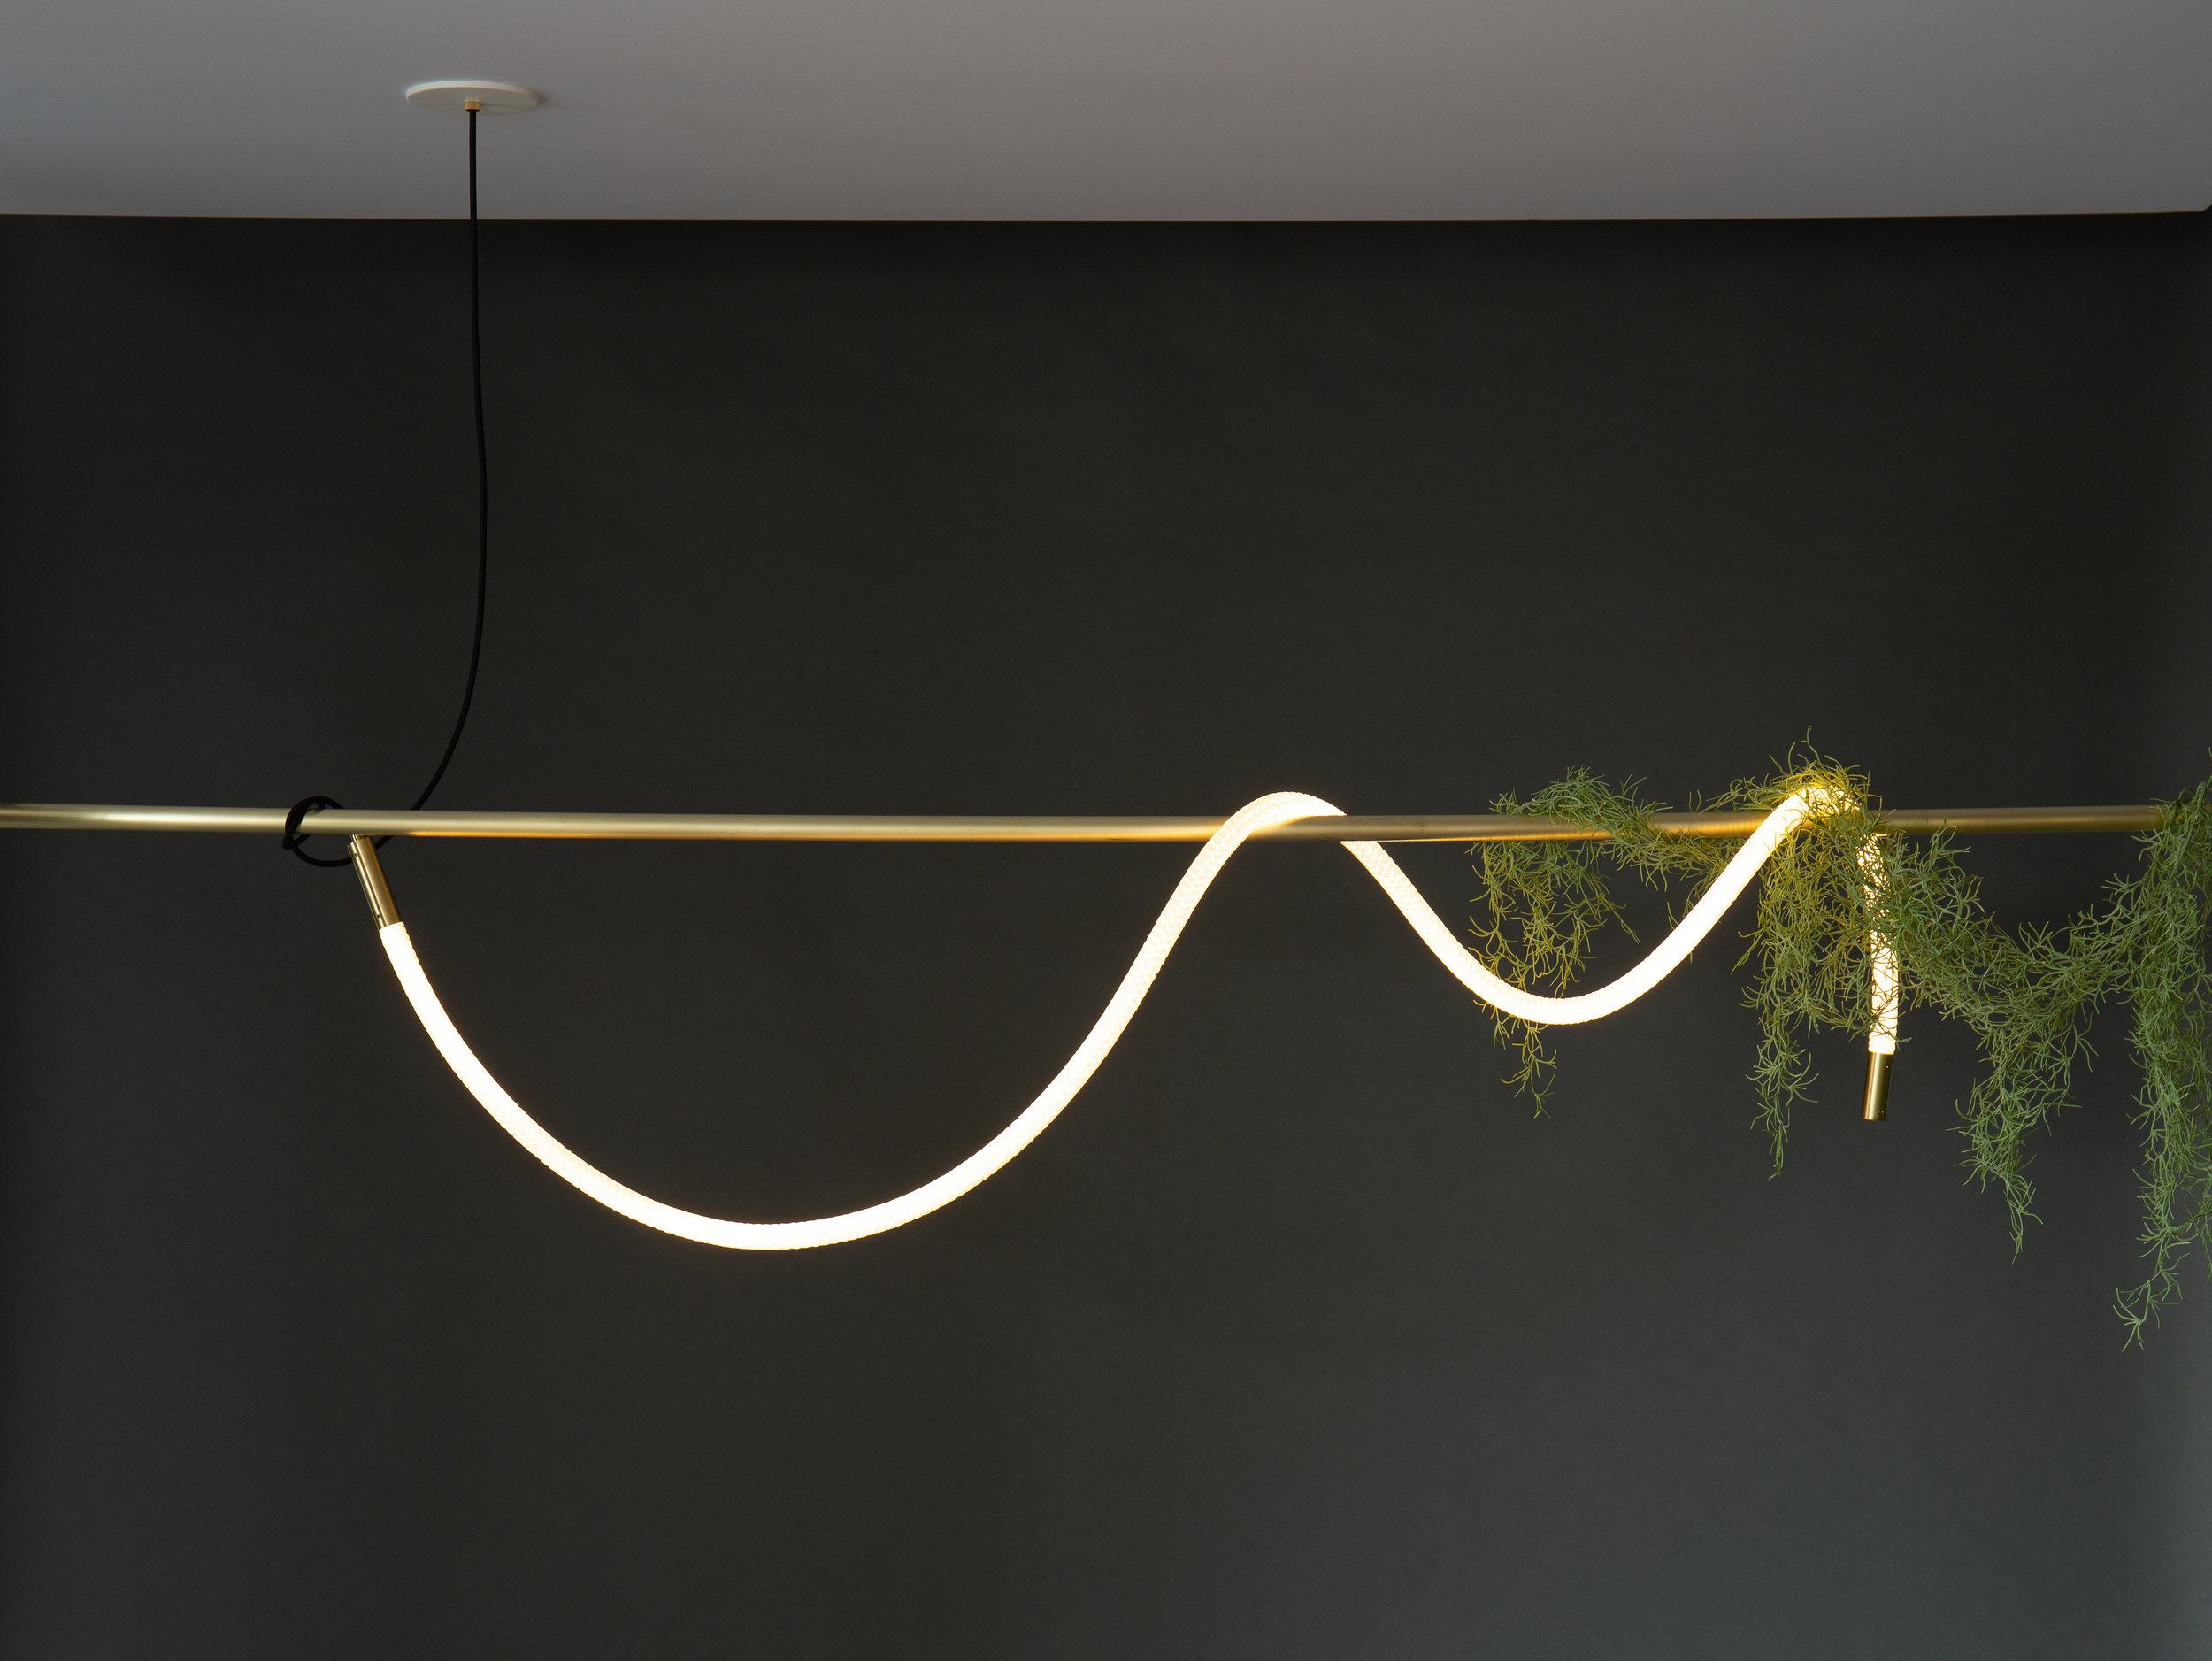 Tracer Loop - Free End